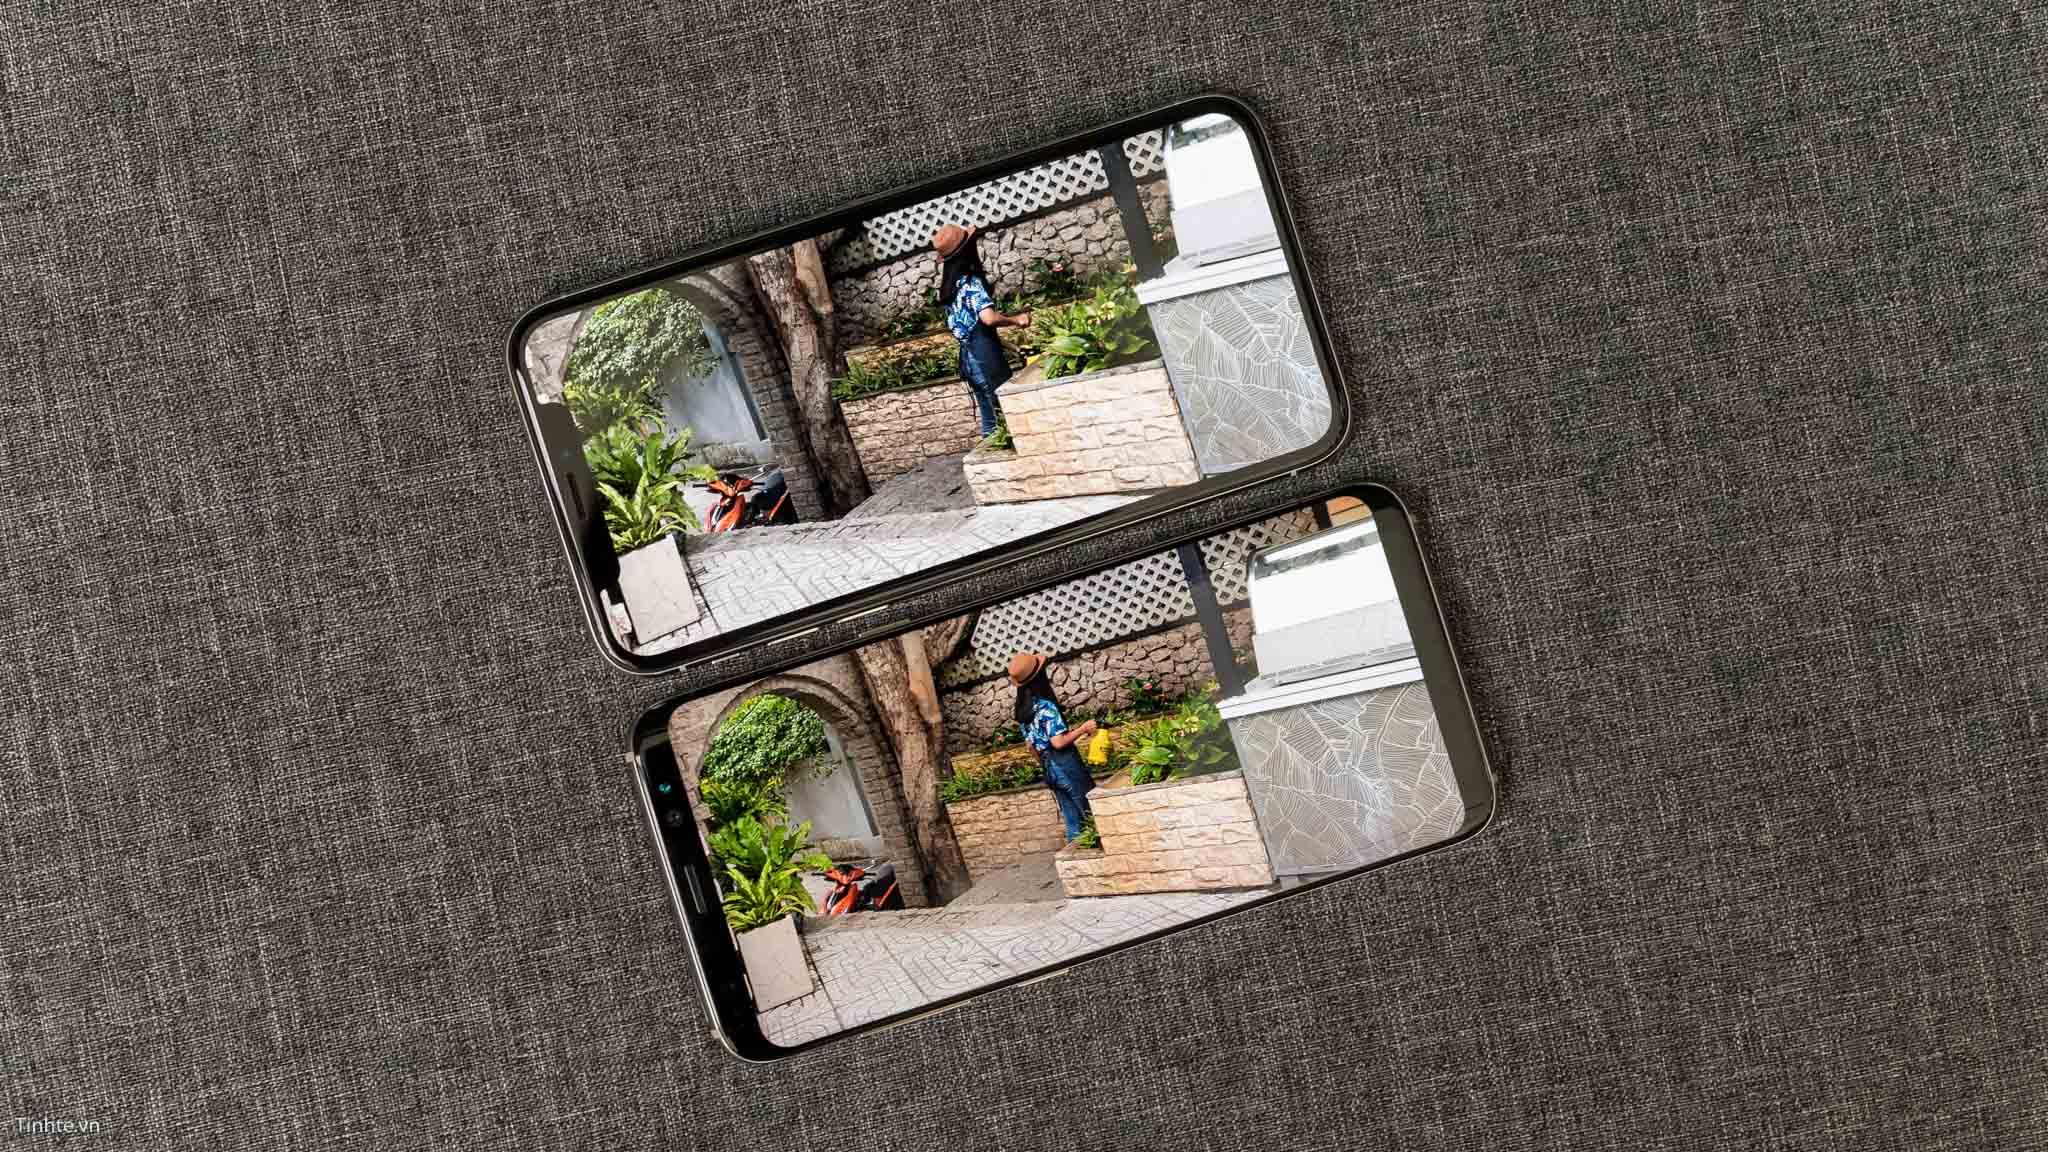 iphonex-s8-tinhte-13.jpg